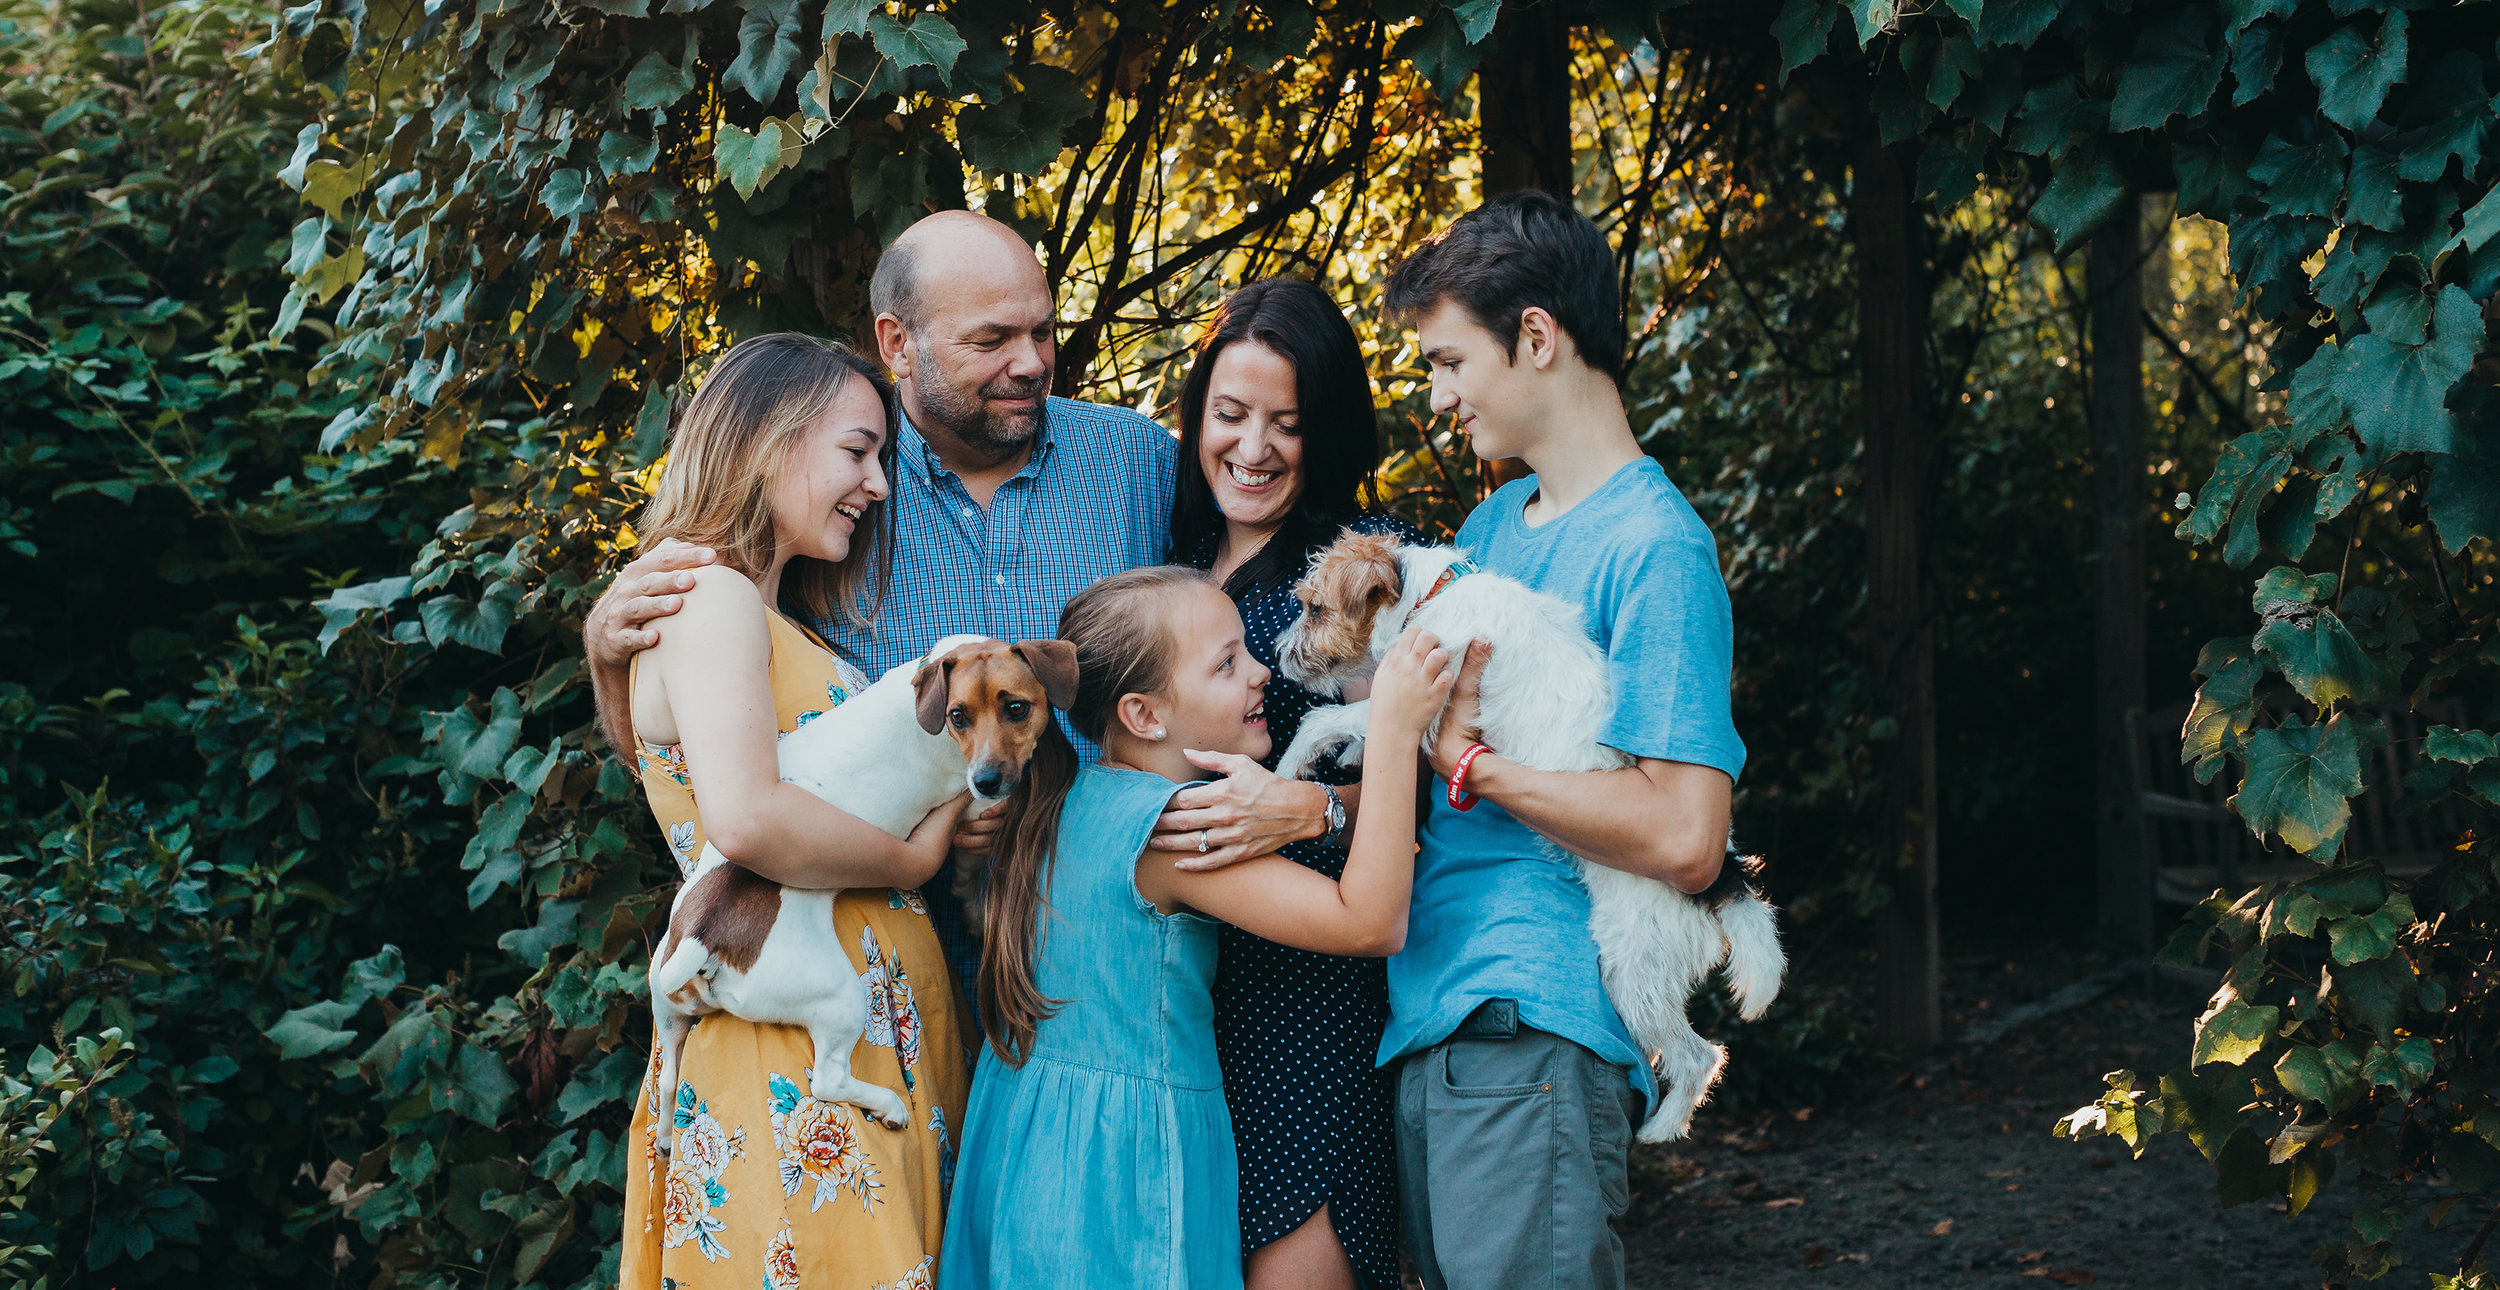 joyleducphotography-bostonfamilyphotographer-lifestyleportraiture-8.jpg